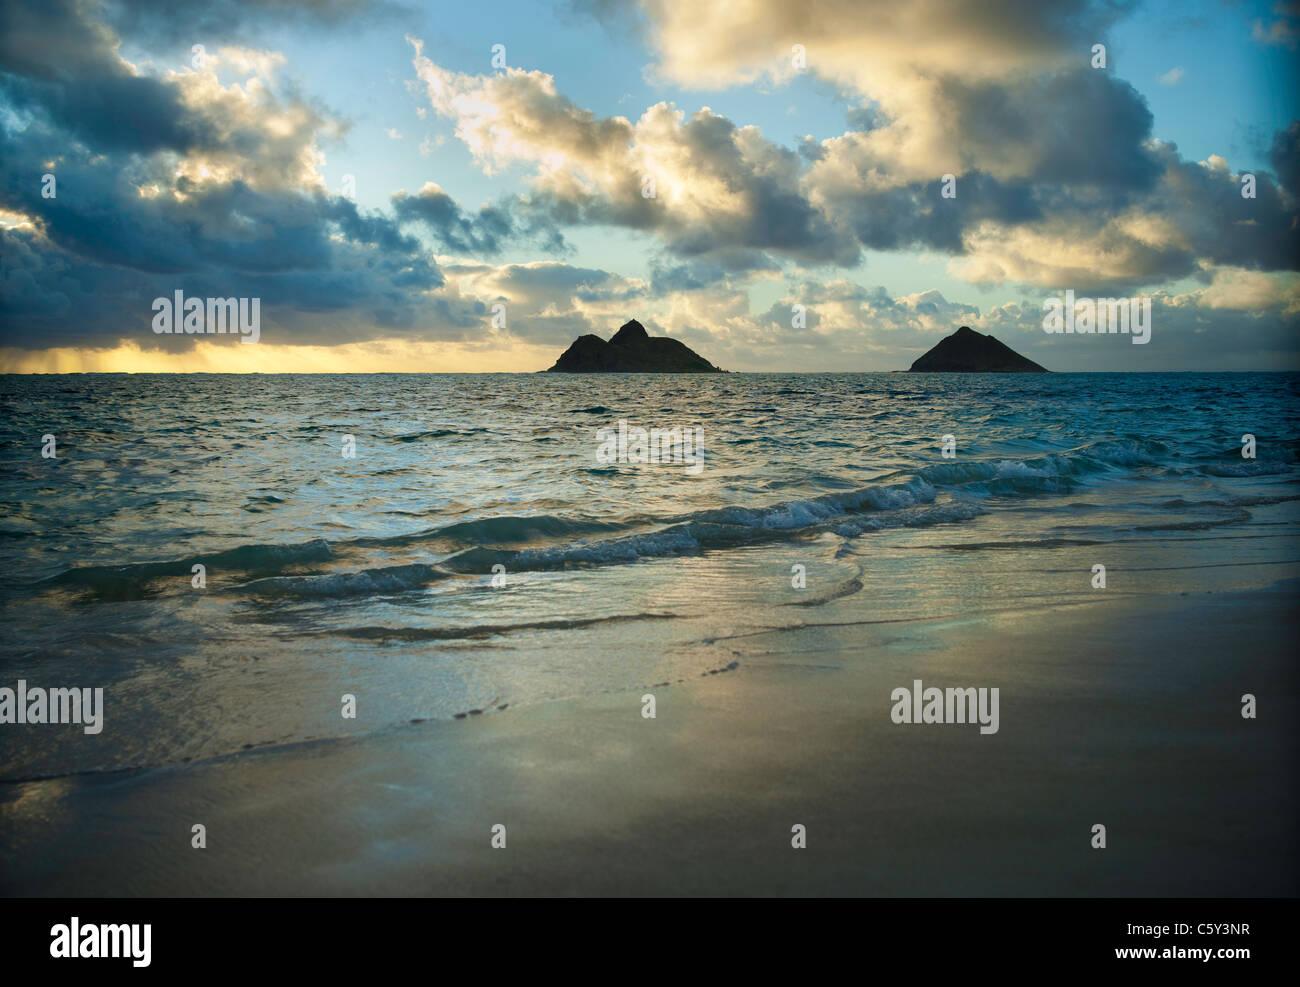 Sunrise at Lanikai Beach on the Windward Oahu coastline, Mokolua Islands in distance. - Stock Image